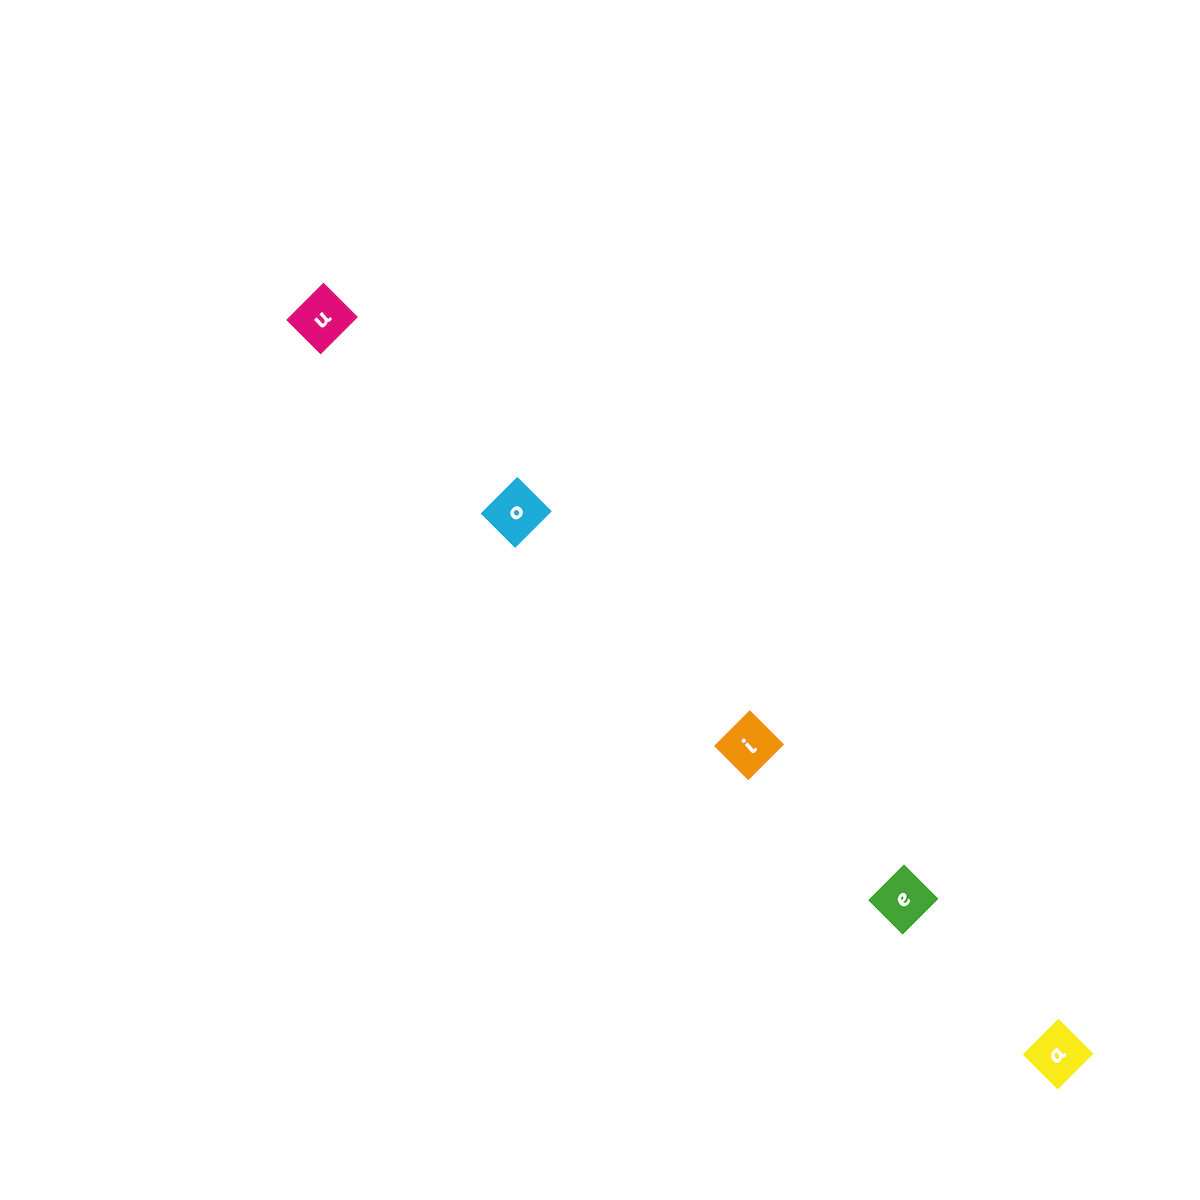 Playground Marking a-z Ladder with Vowels